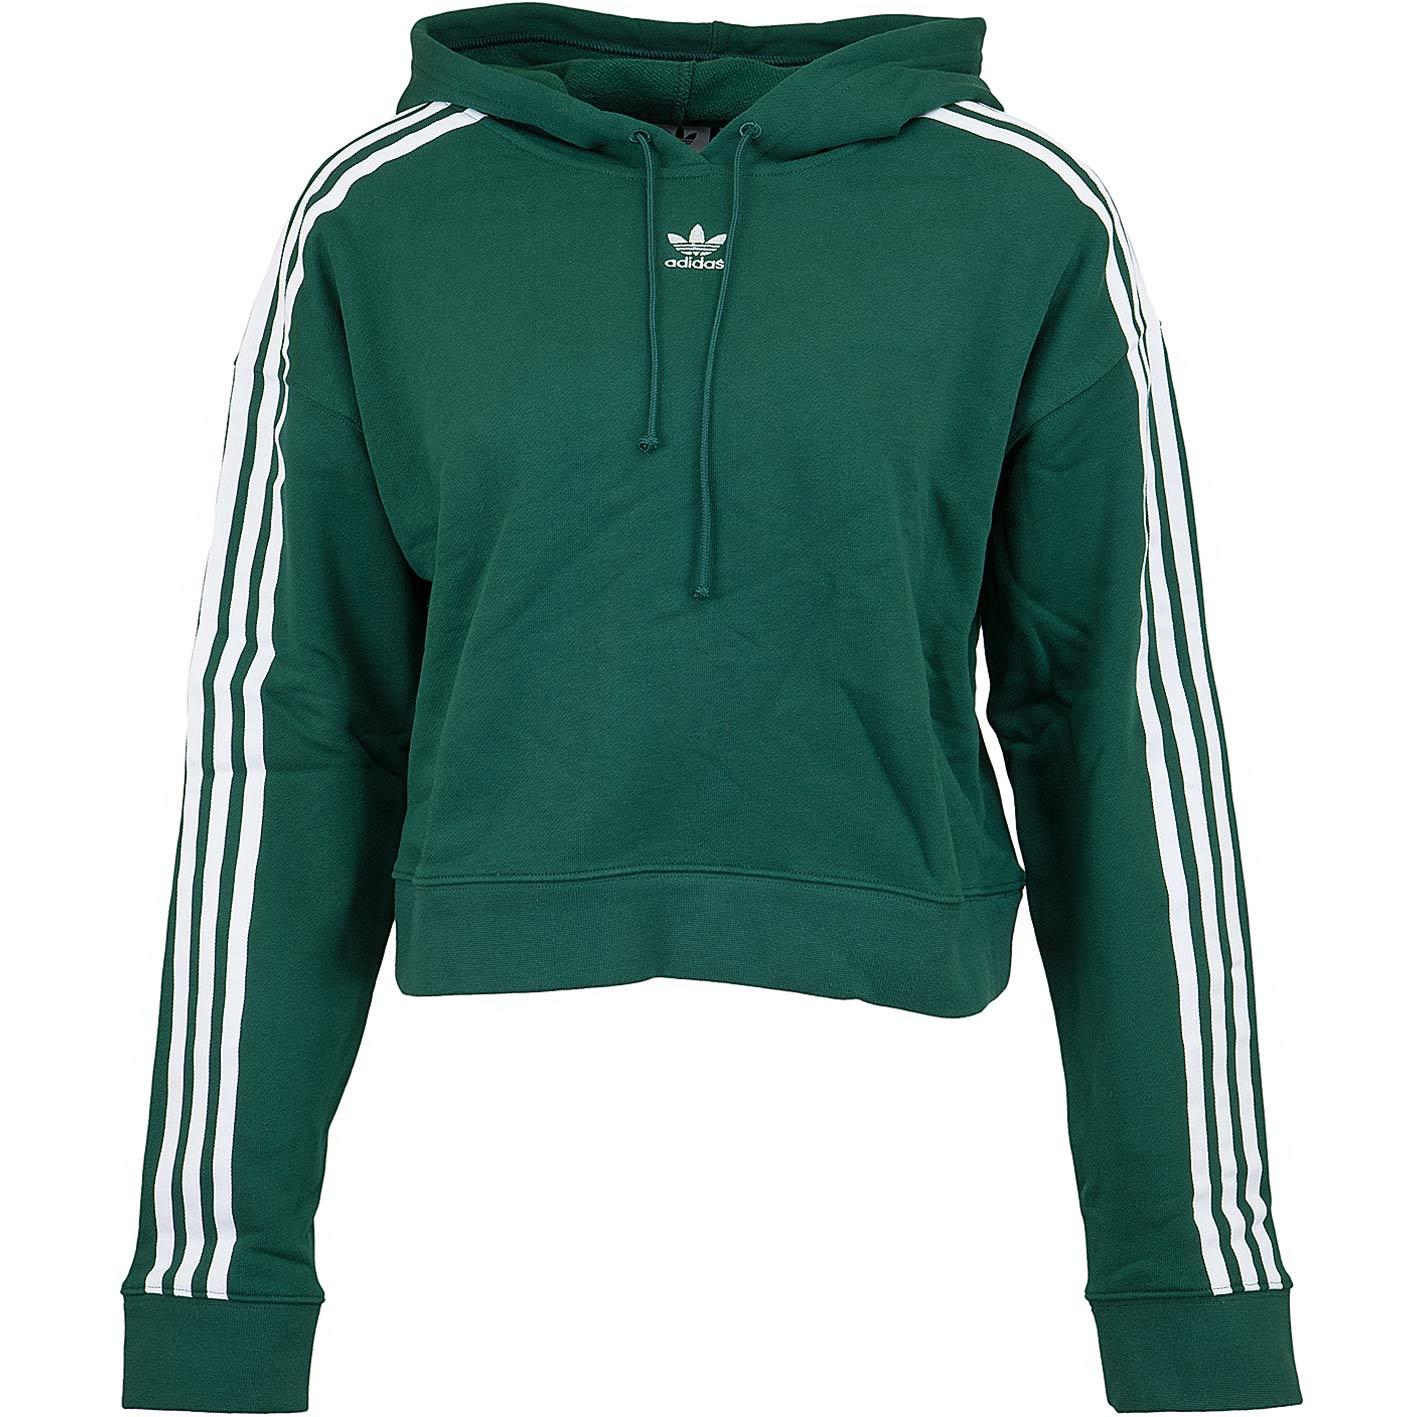 ☆ Adidas Originals Damen Hoody Cropped grün hier bestellen!